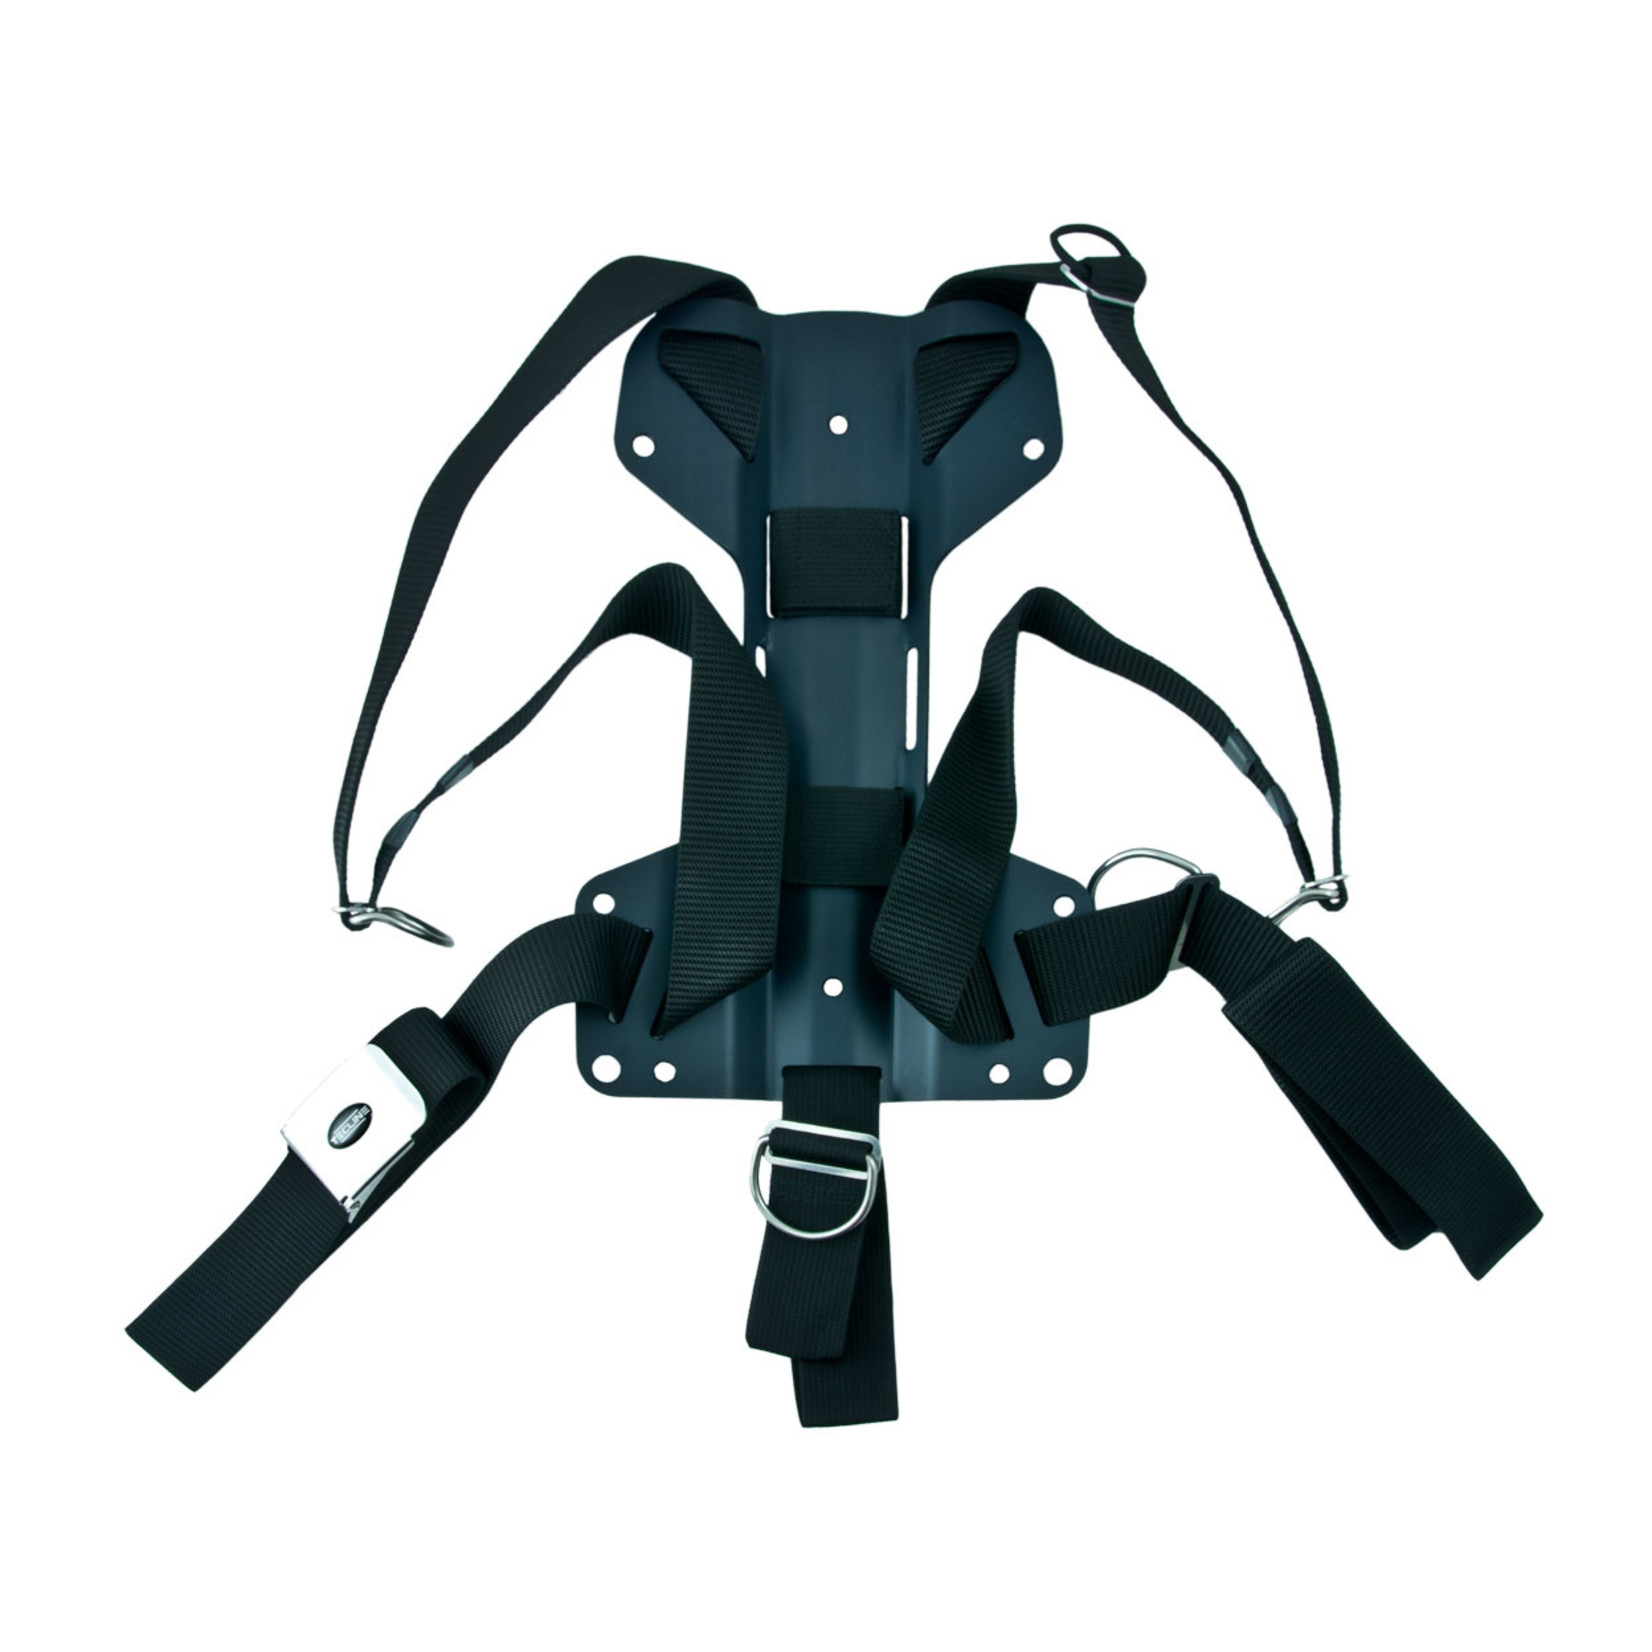 Tecline Harness Tecline DIR standard webbing - incl. 3mm aluminum backplate H MINI - weight 0,91 kg